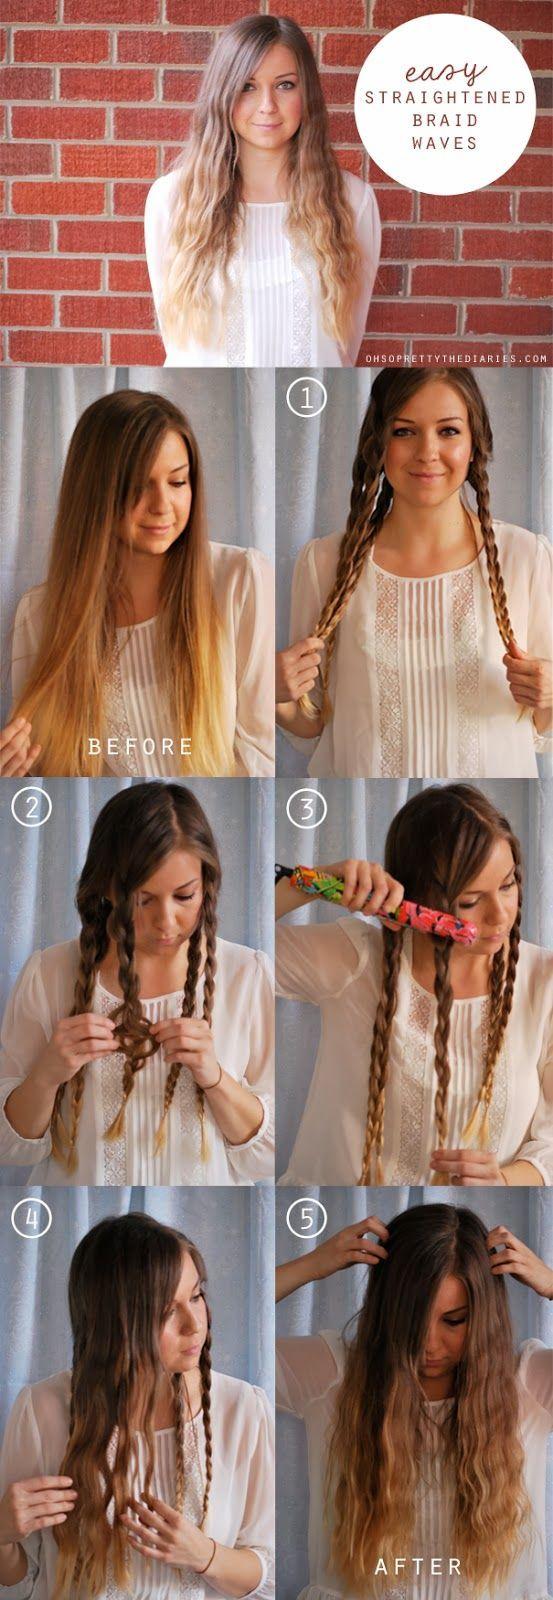 Easy Straightened Braid Waves